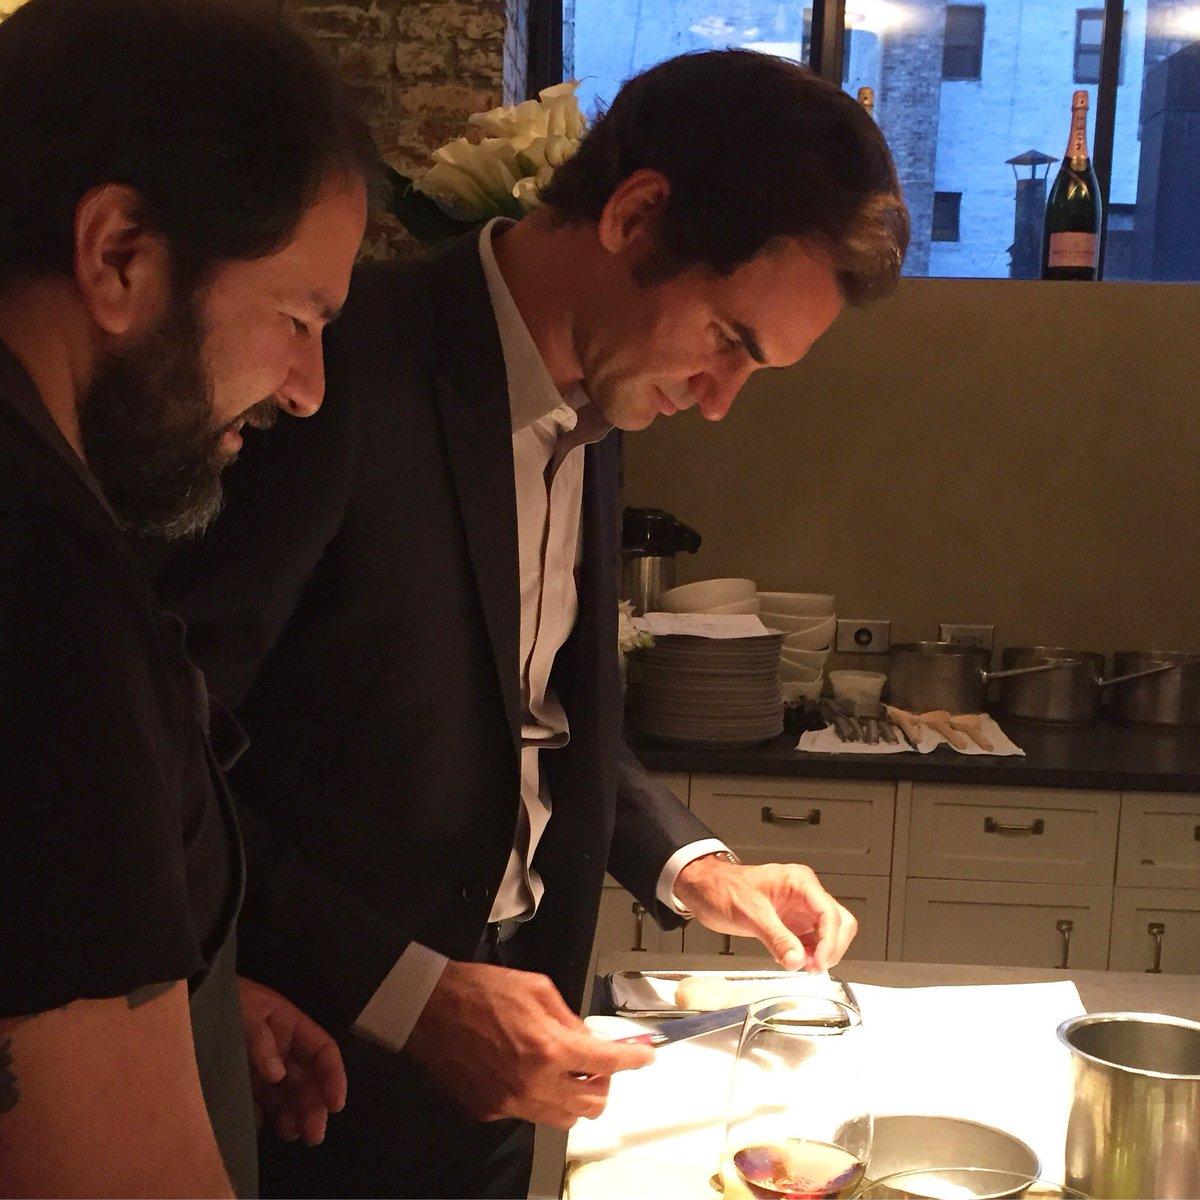 Cool hanging out & slicing up scallops w @enriqueolvera & @rogerfederer (!)  #foodandwine #MoetChandon #Champagne https://t.co/bMmx5w7l1i